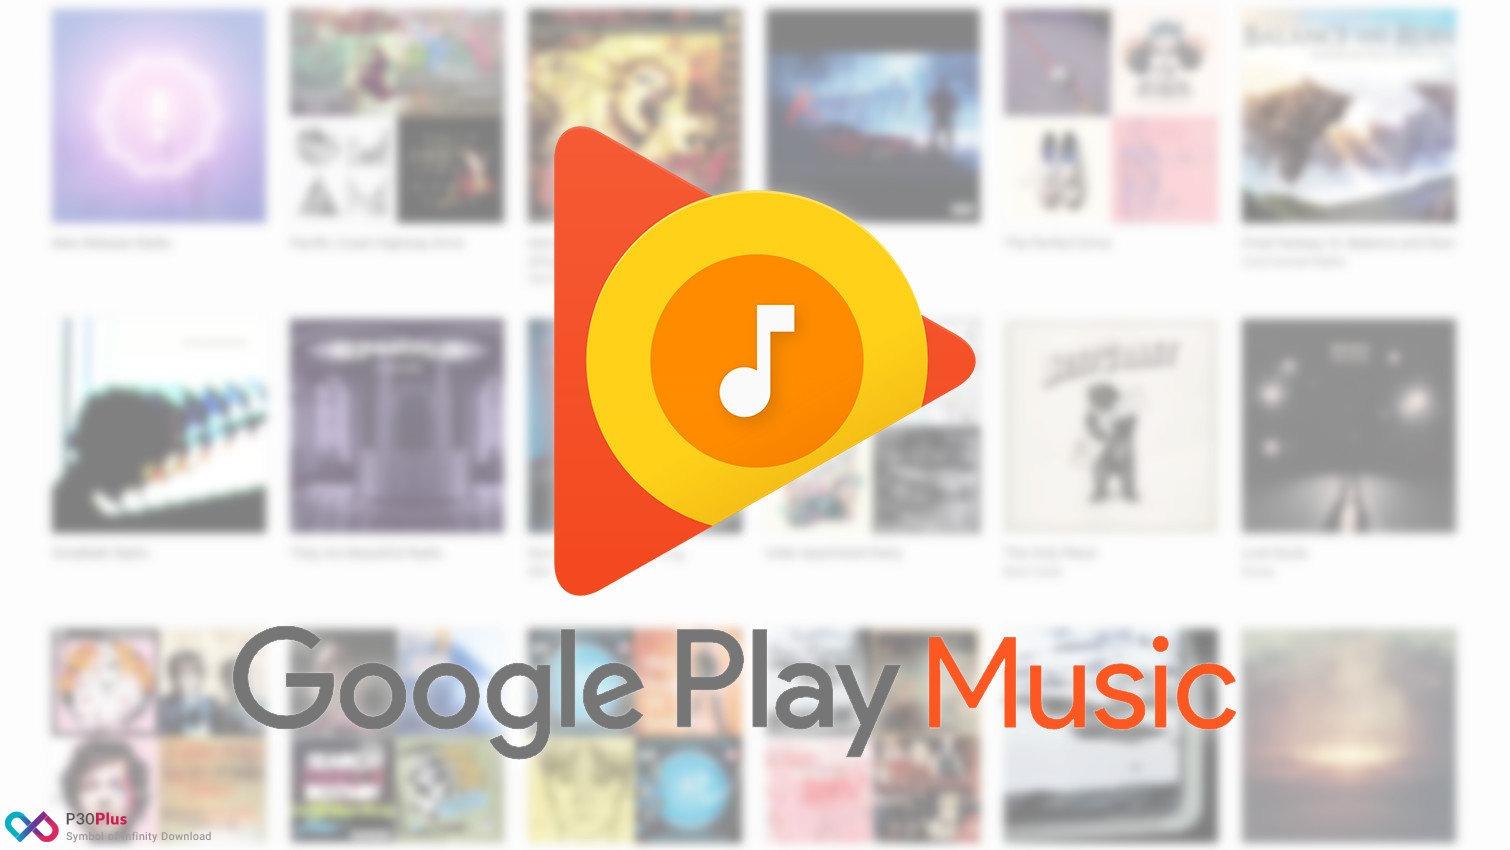 گوگل پلی موزیک -Google Play Music